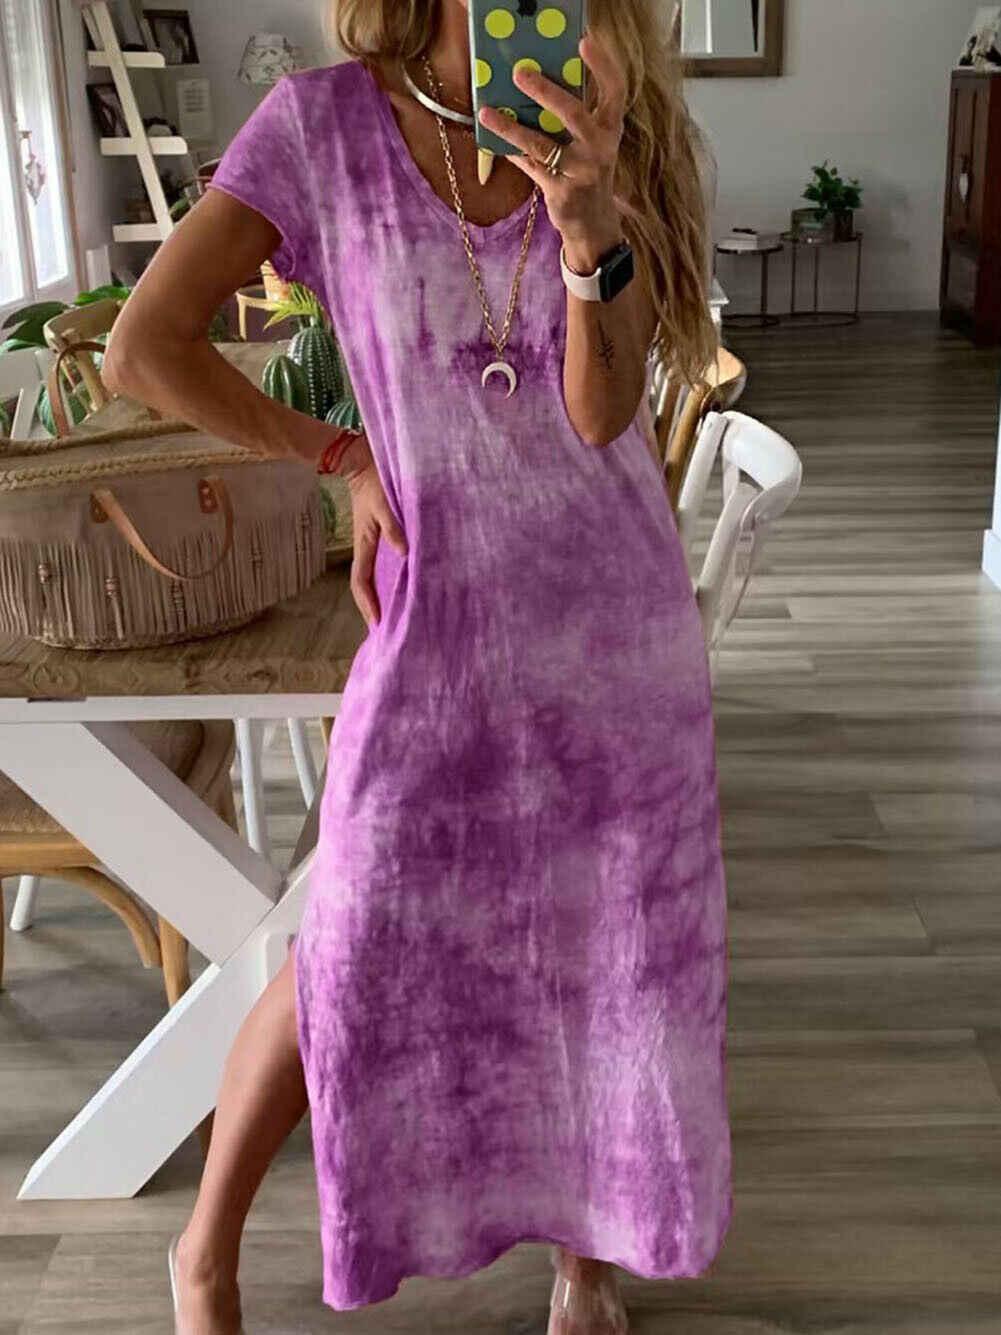 Plus Size Womens Katoen Zomer Korte Mouw Lange T-shirt Dames Casual Dress Boho Kaftan Tuniek Gypsy Etnische Beach Party Zonnejurk